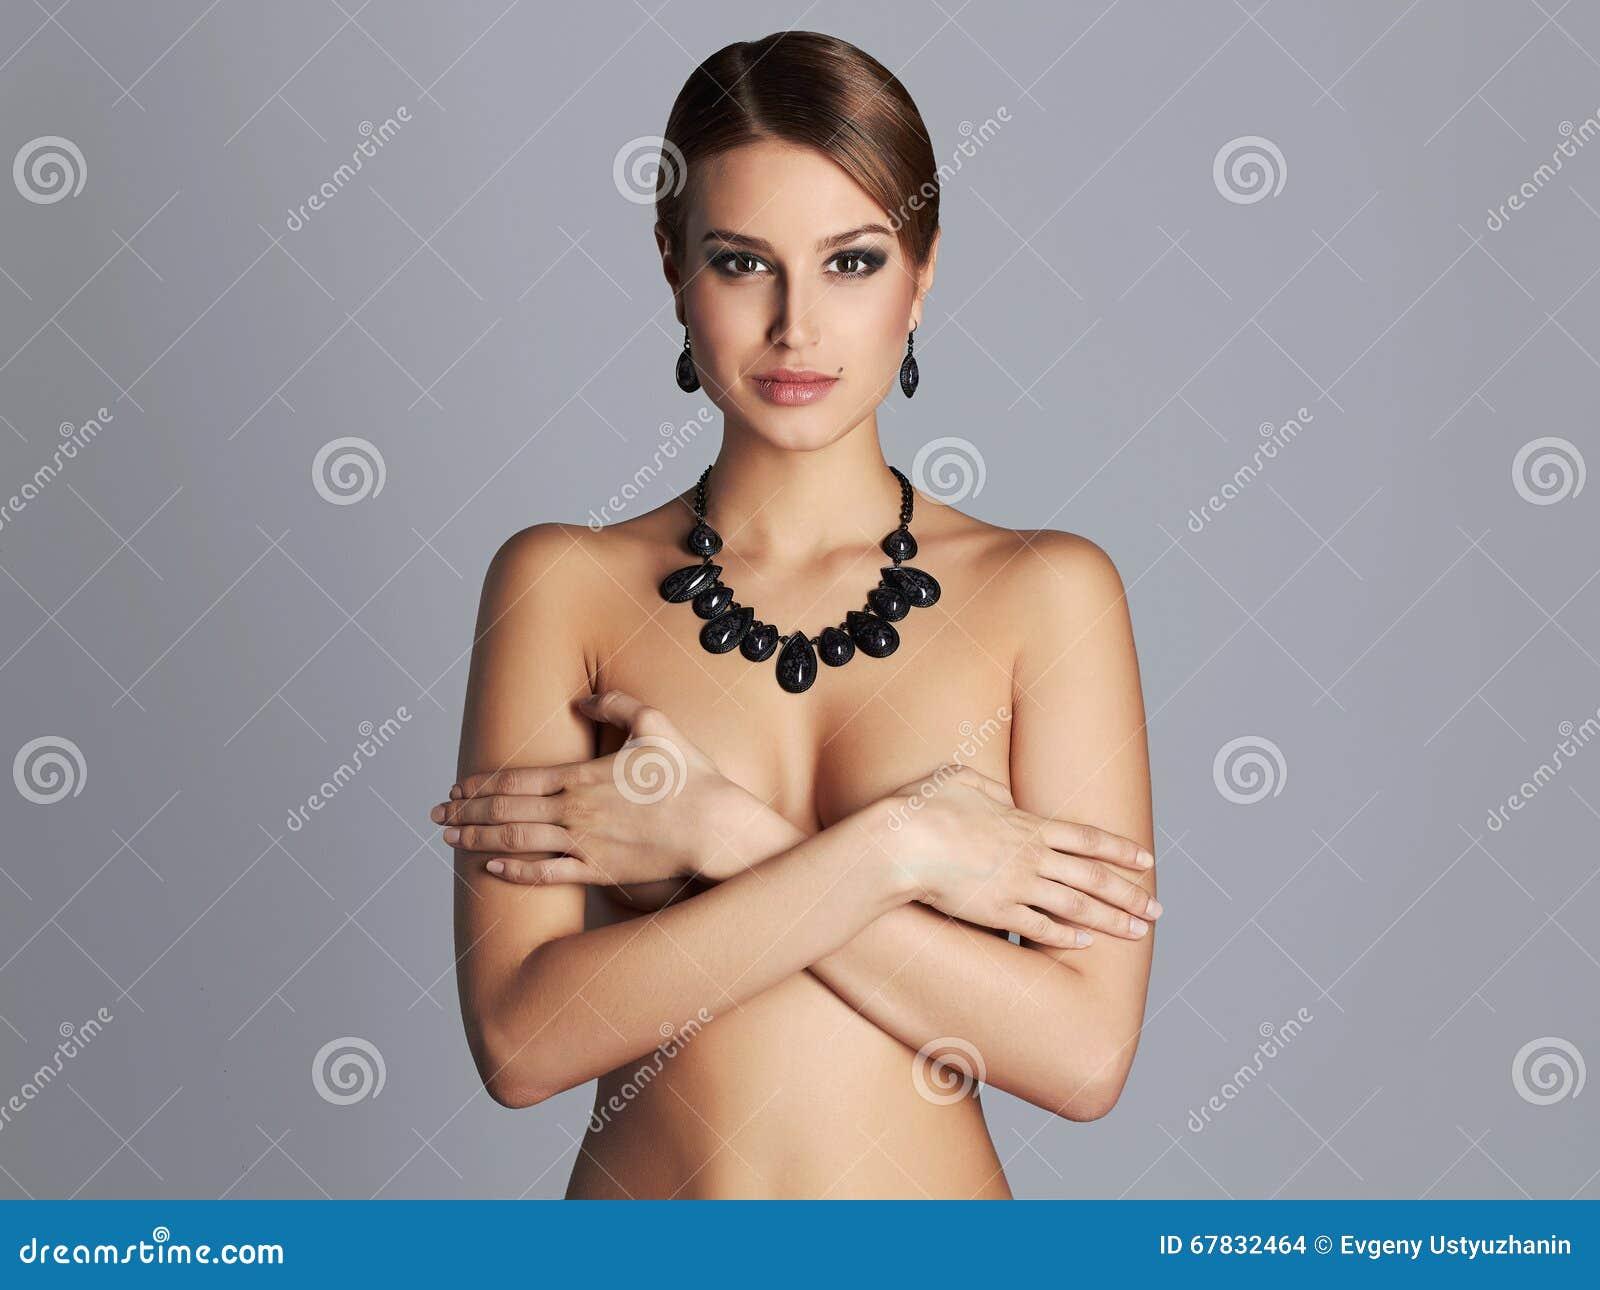 NUD σέξι κορίτσια